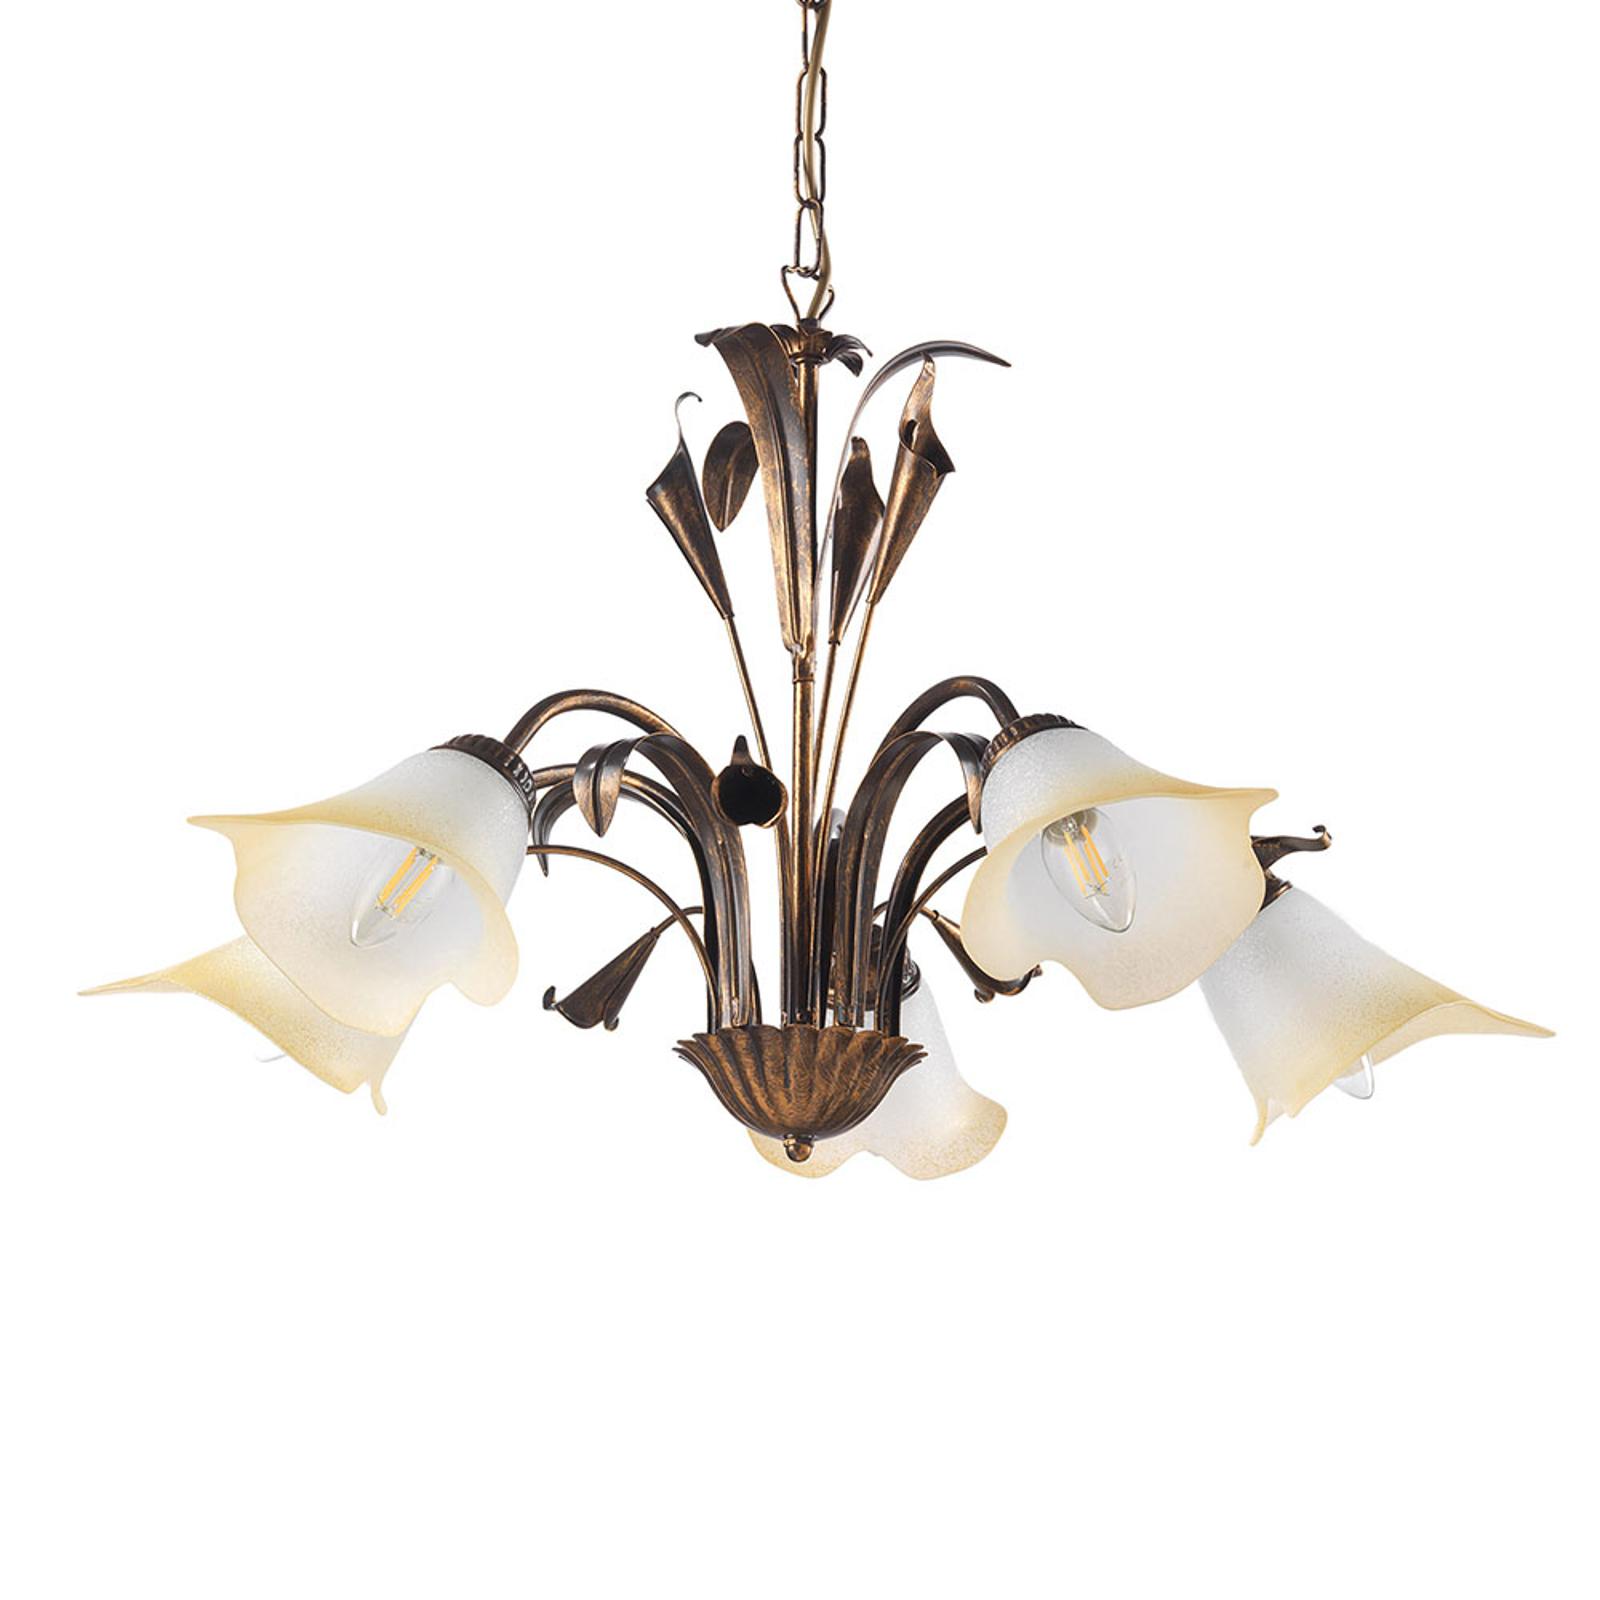 Lucrezia hængelampe, 5 lyskilder, bronze